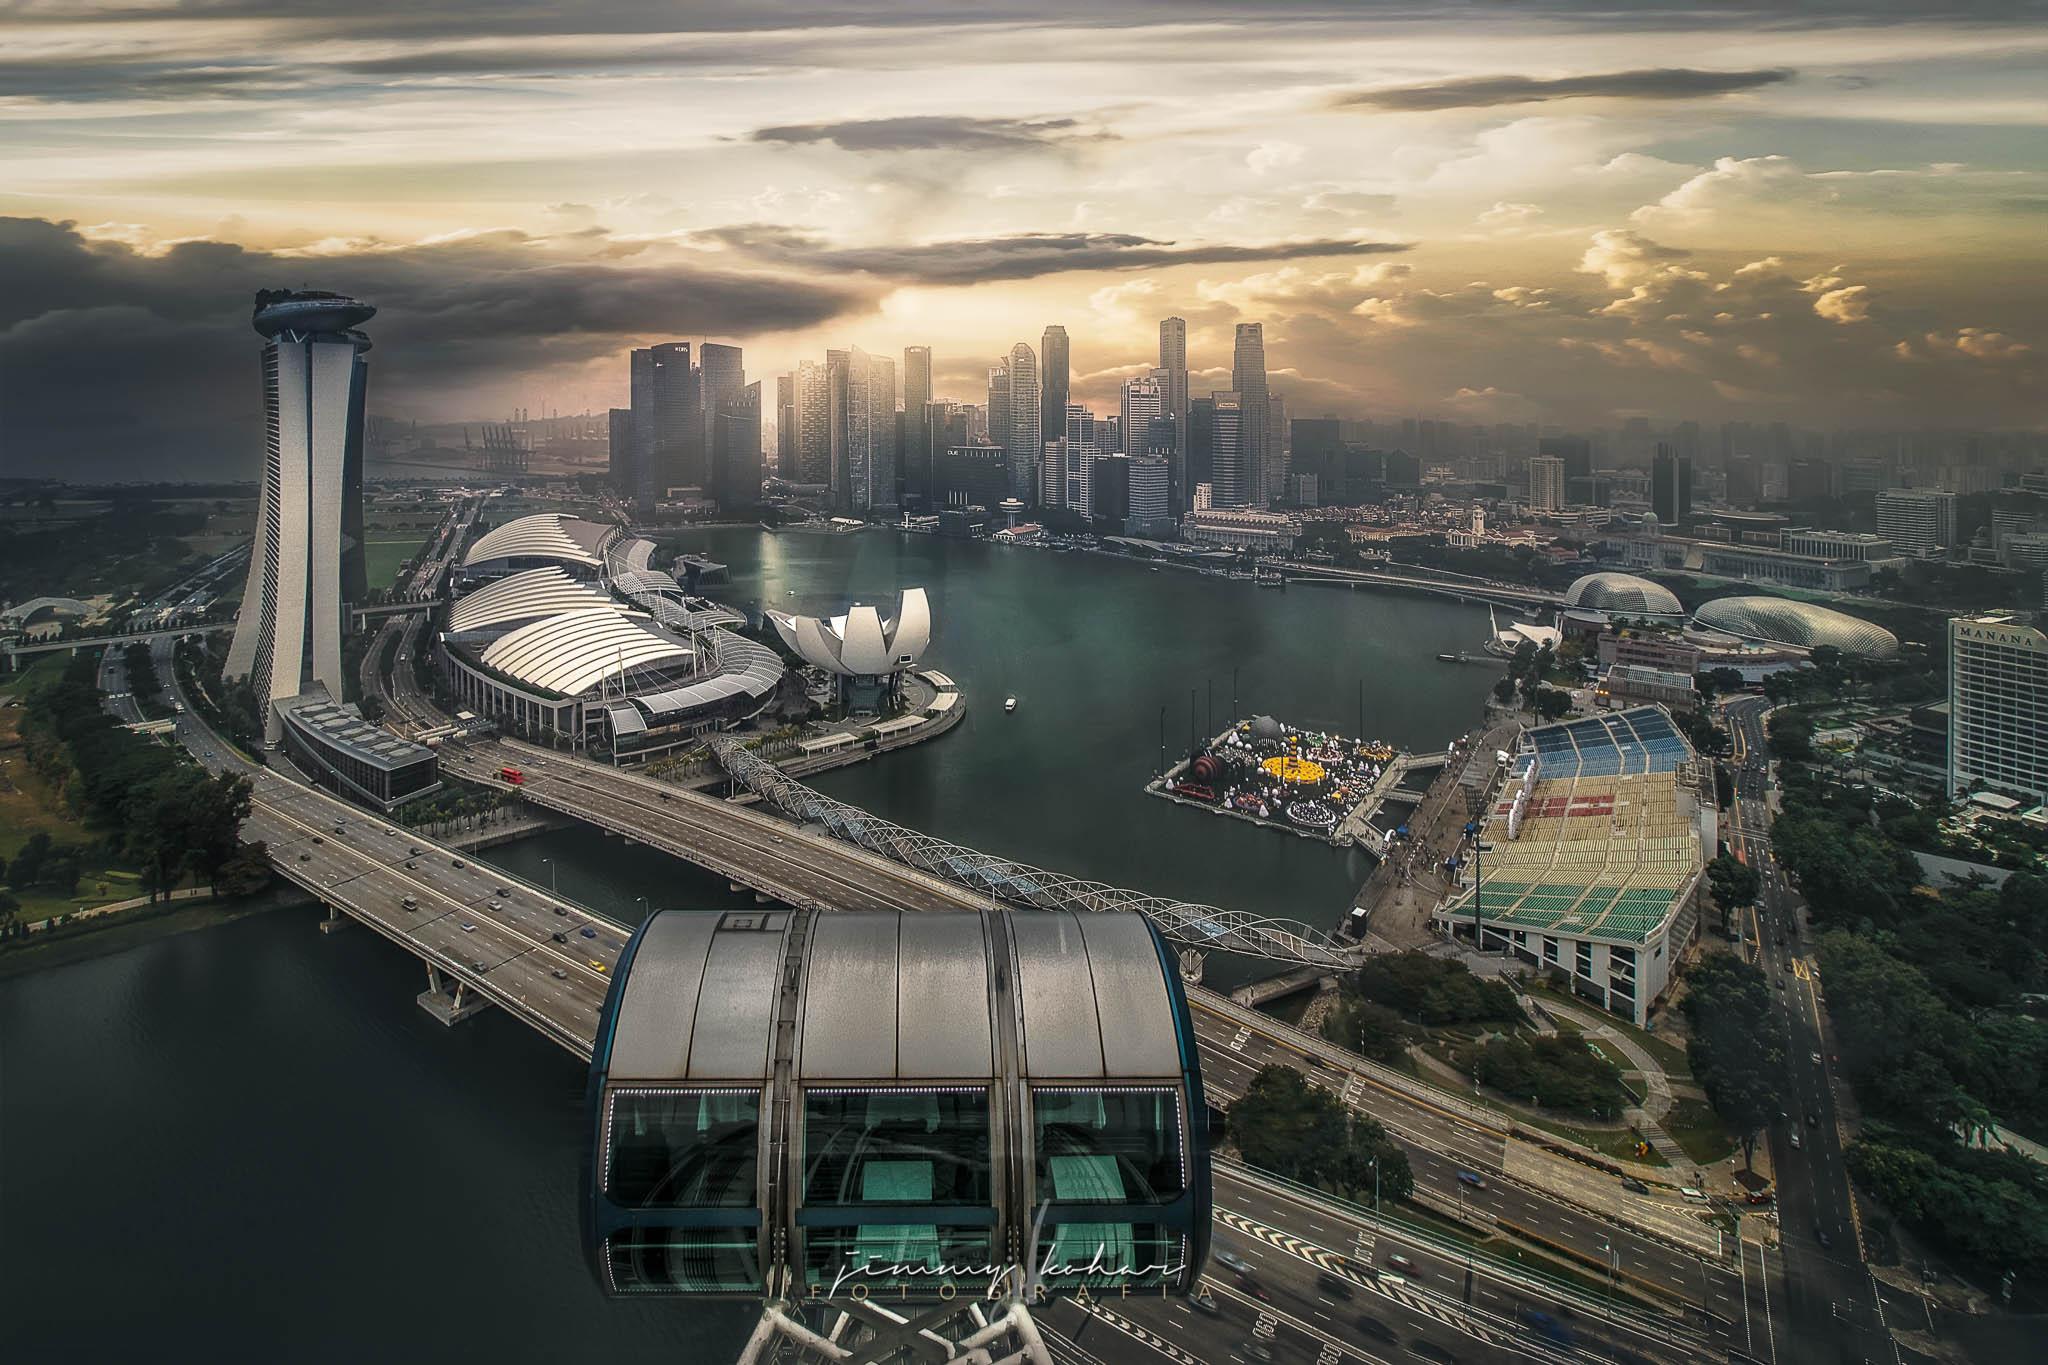 Skyline from Singapore Flyer, Singapore